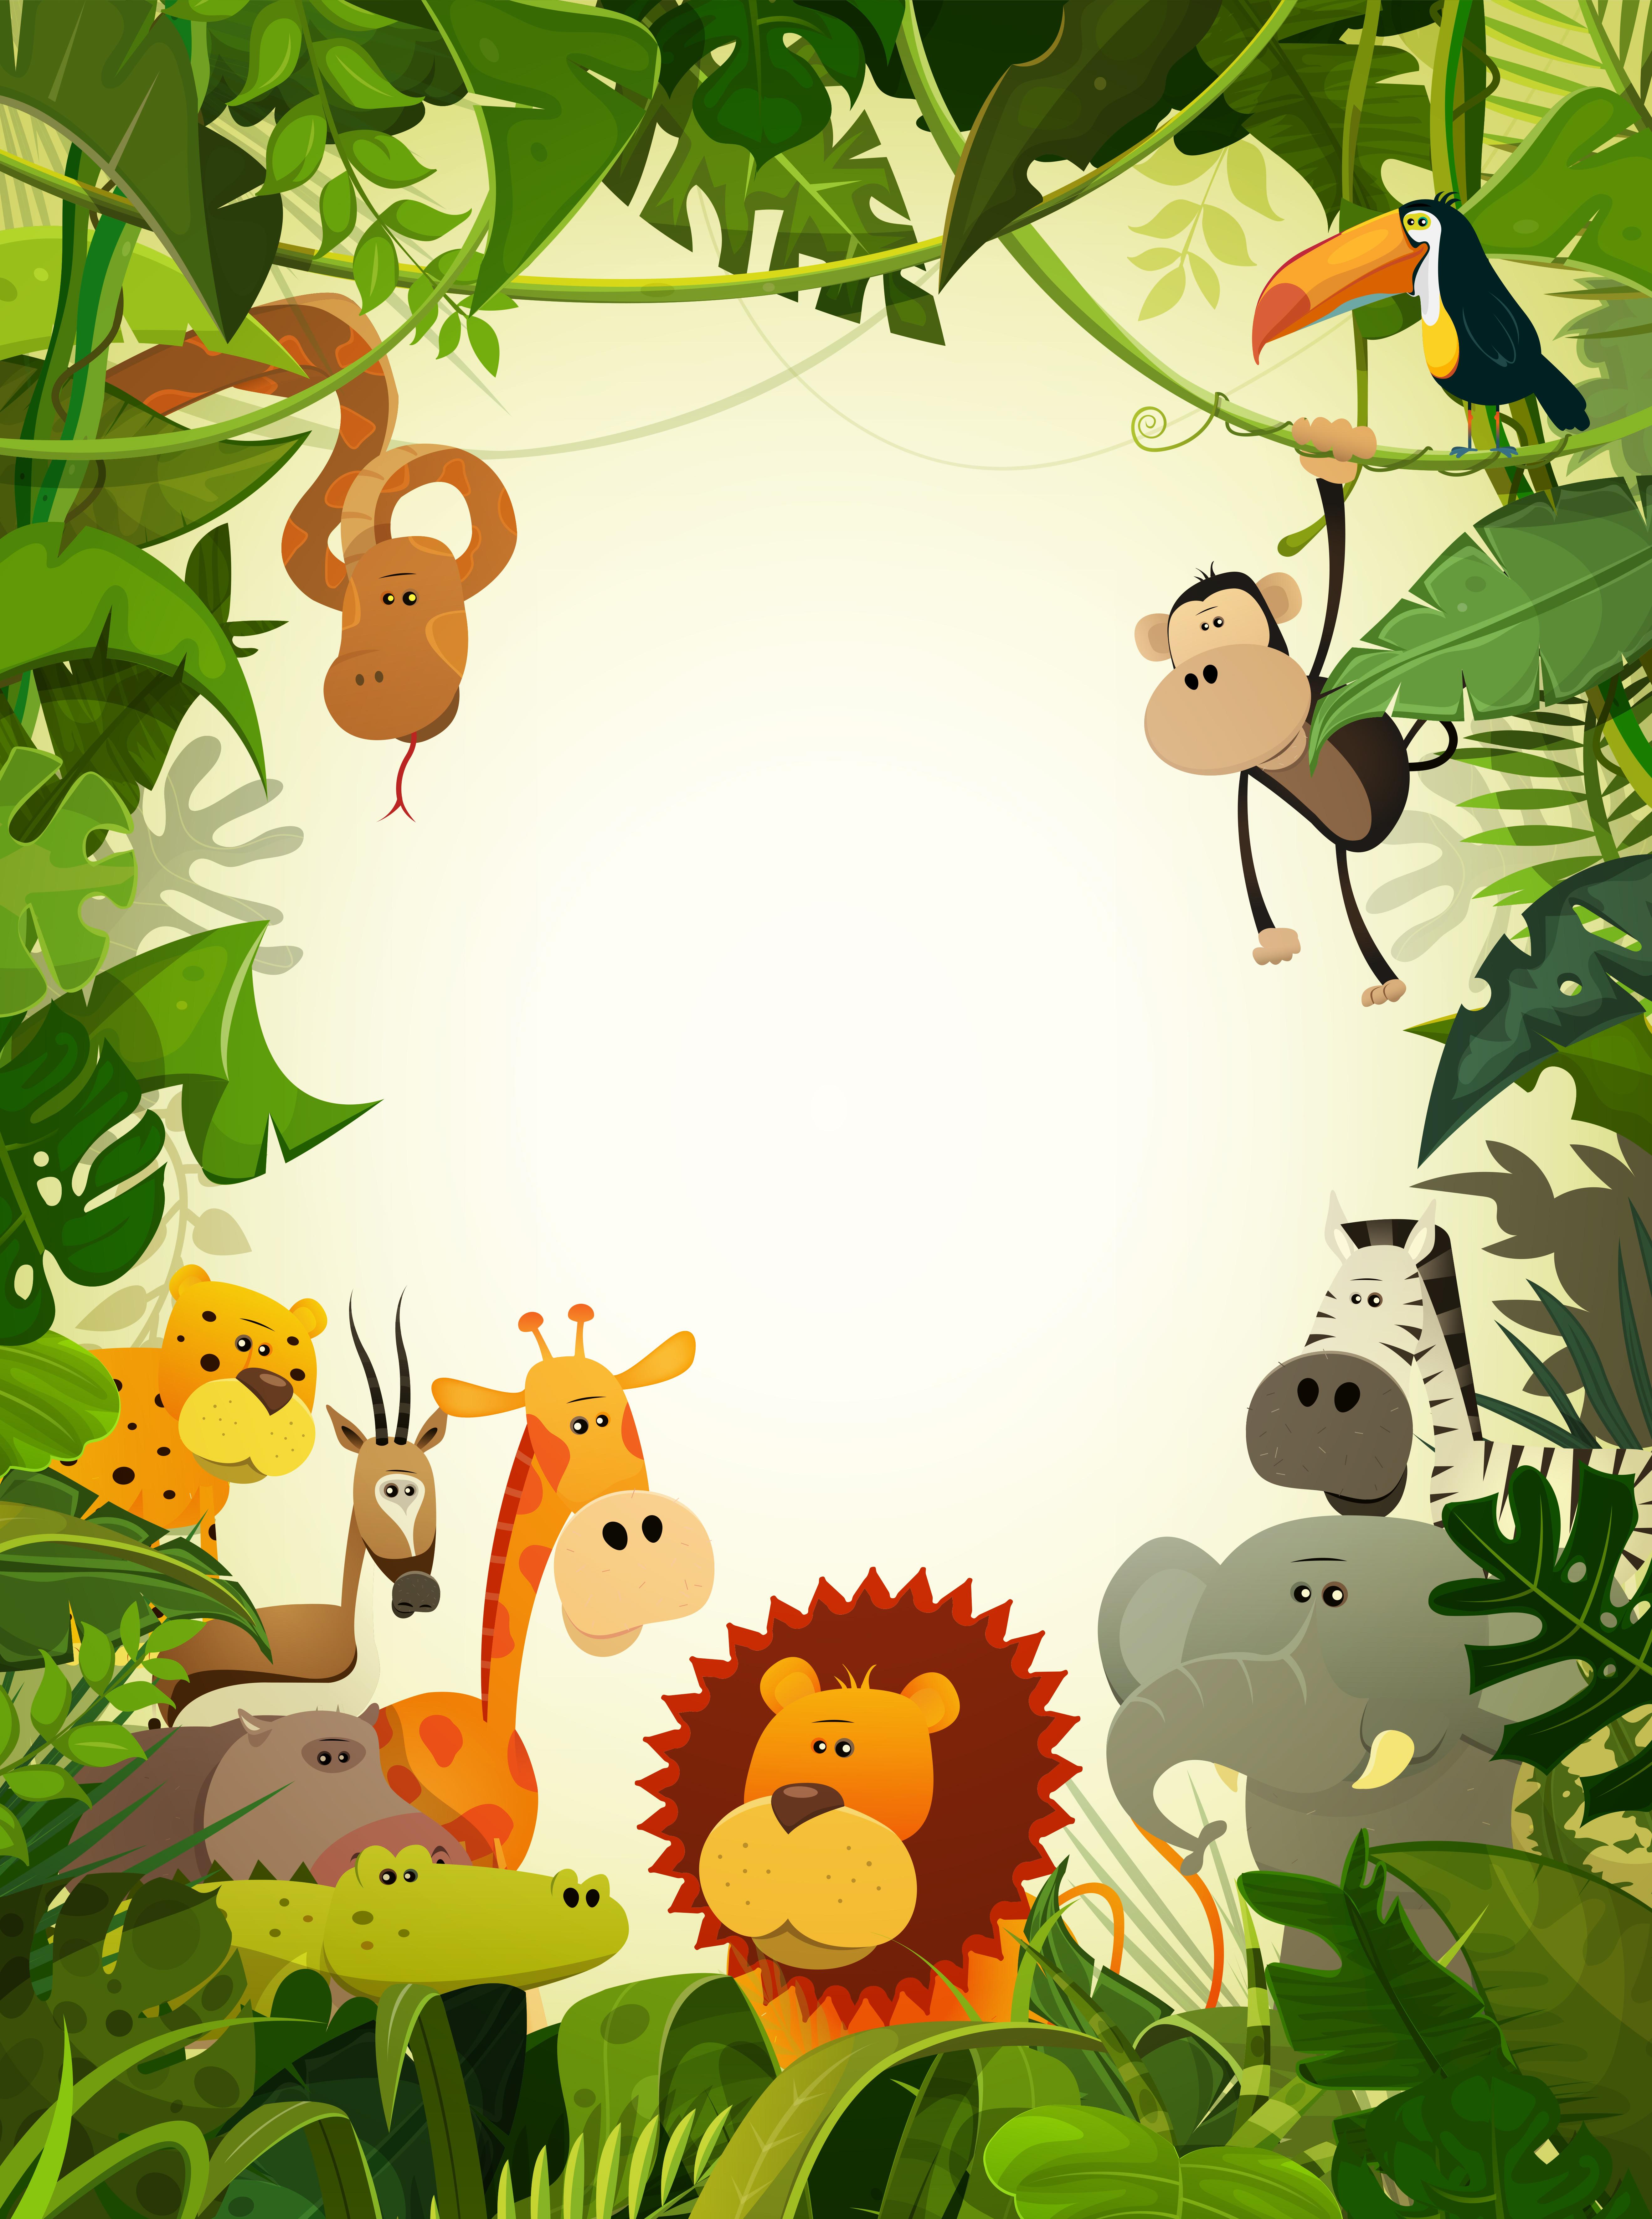 Animated Cheetah Wallpaper wildlife animals wallpaper - download free vectors, clipart